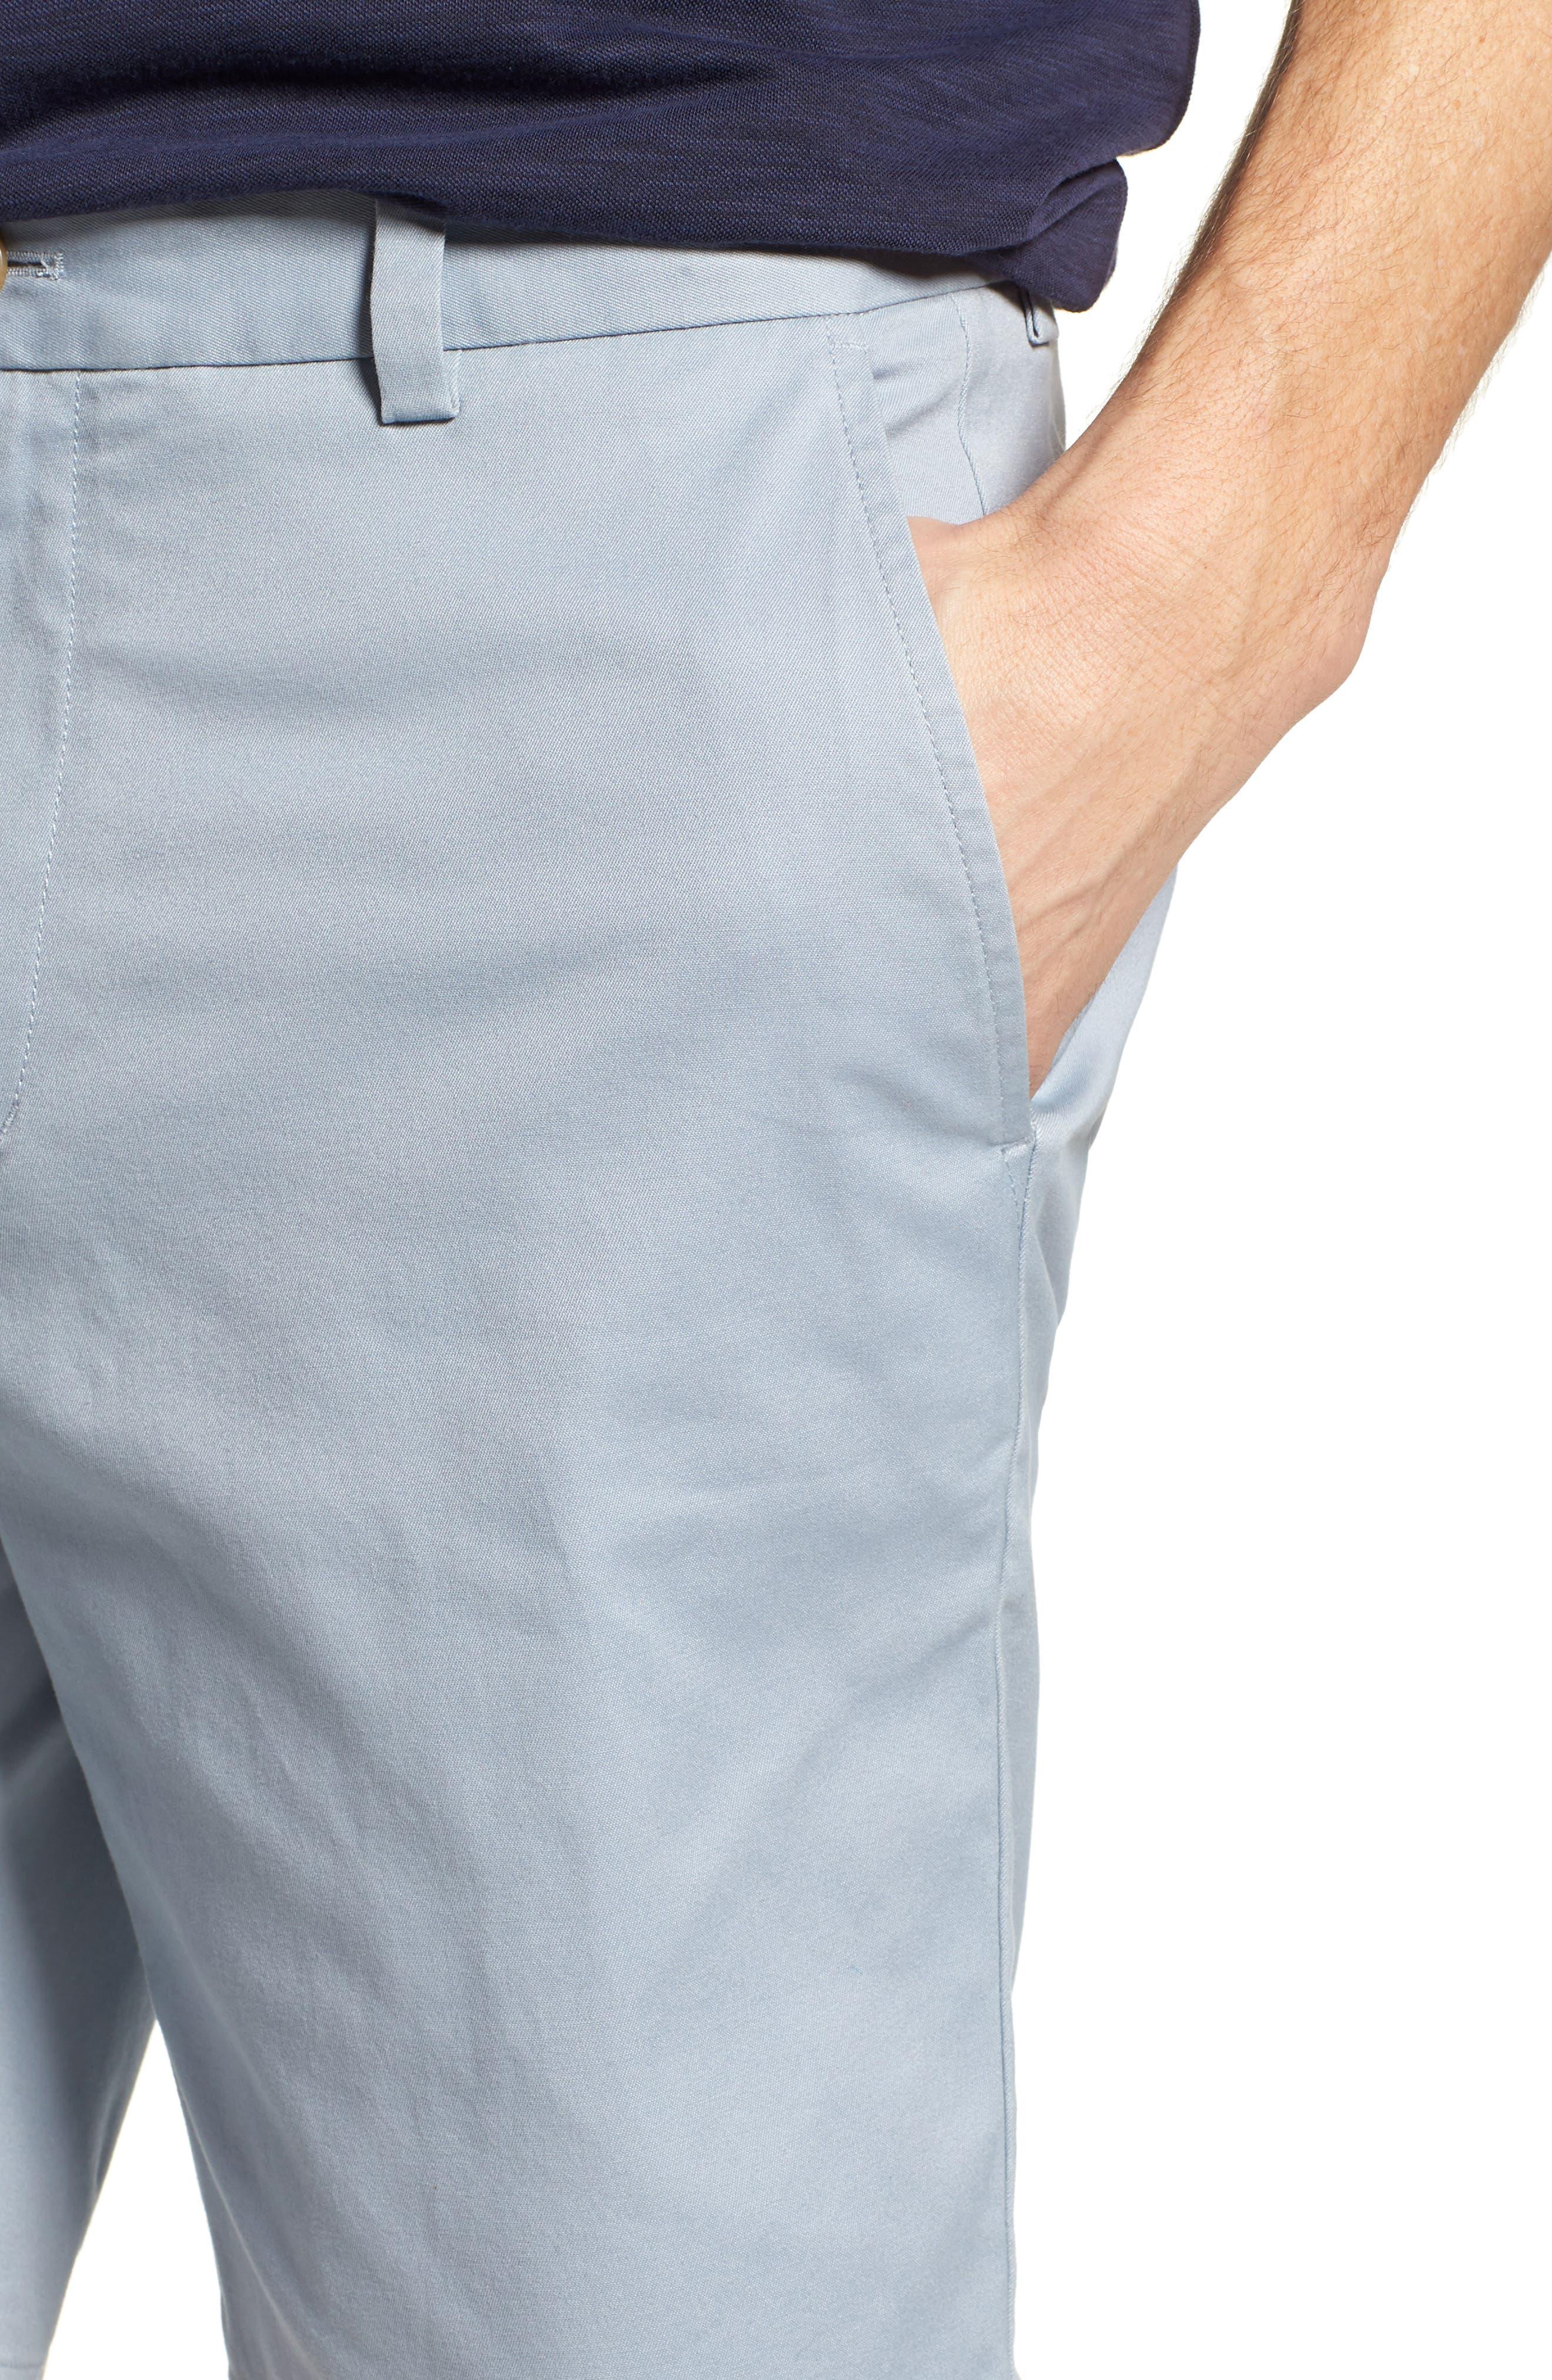 9 Inch Stretch Breaker Shorts,                             Alternate thumbnail 4, color,                             034